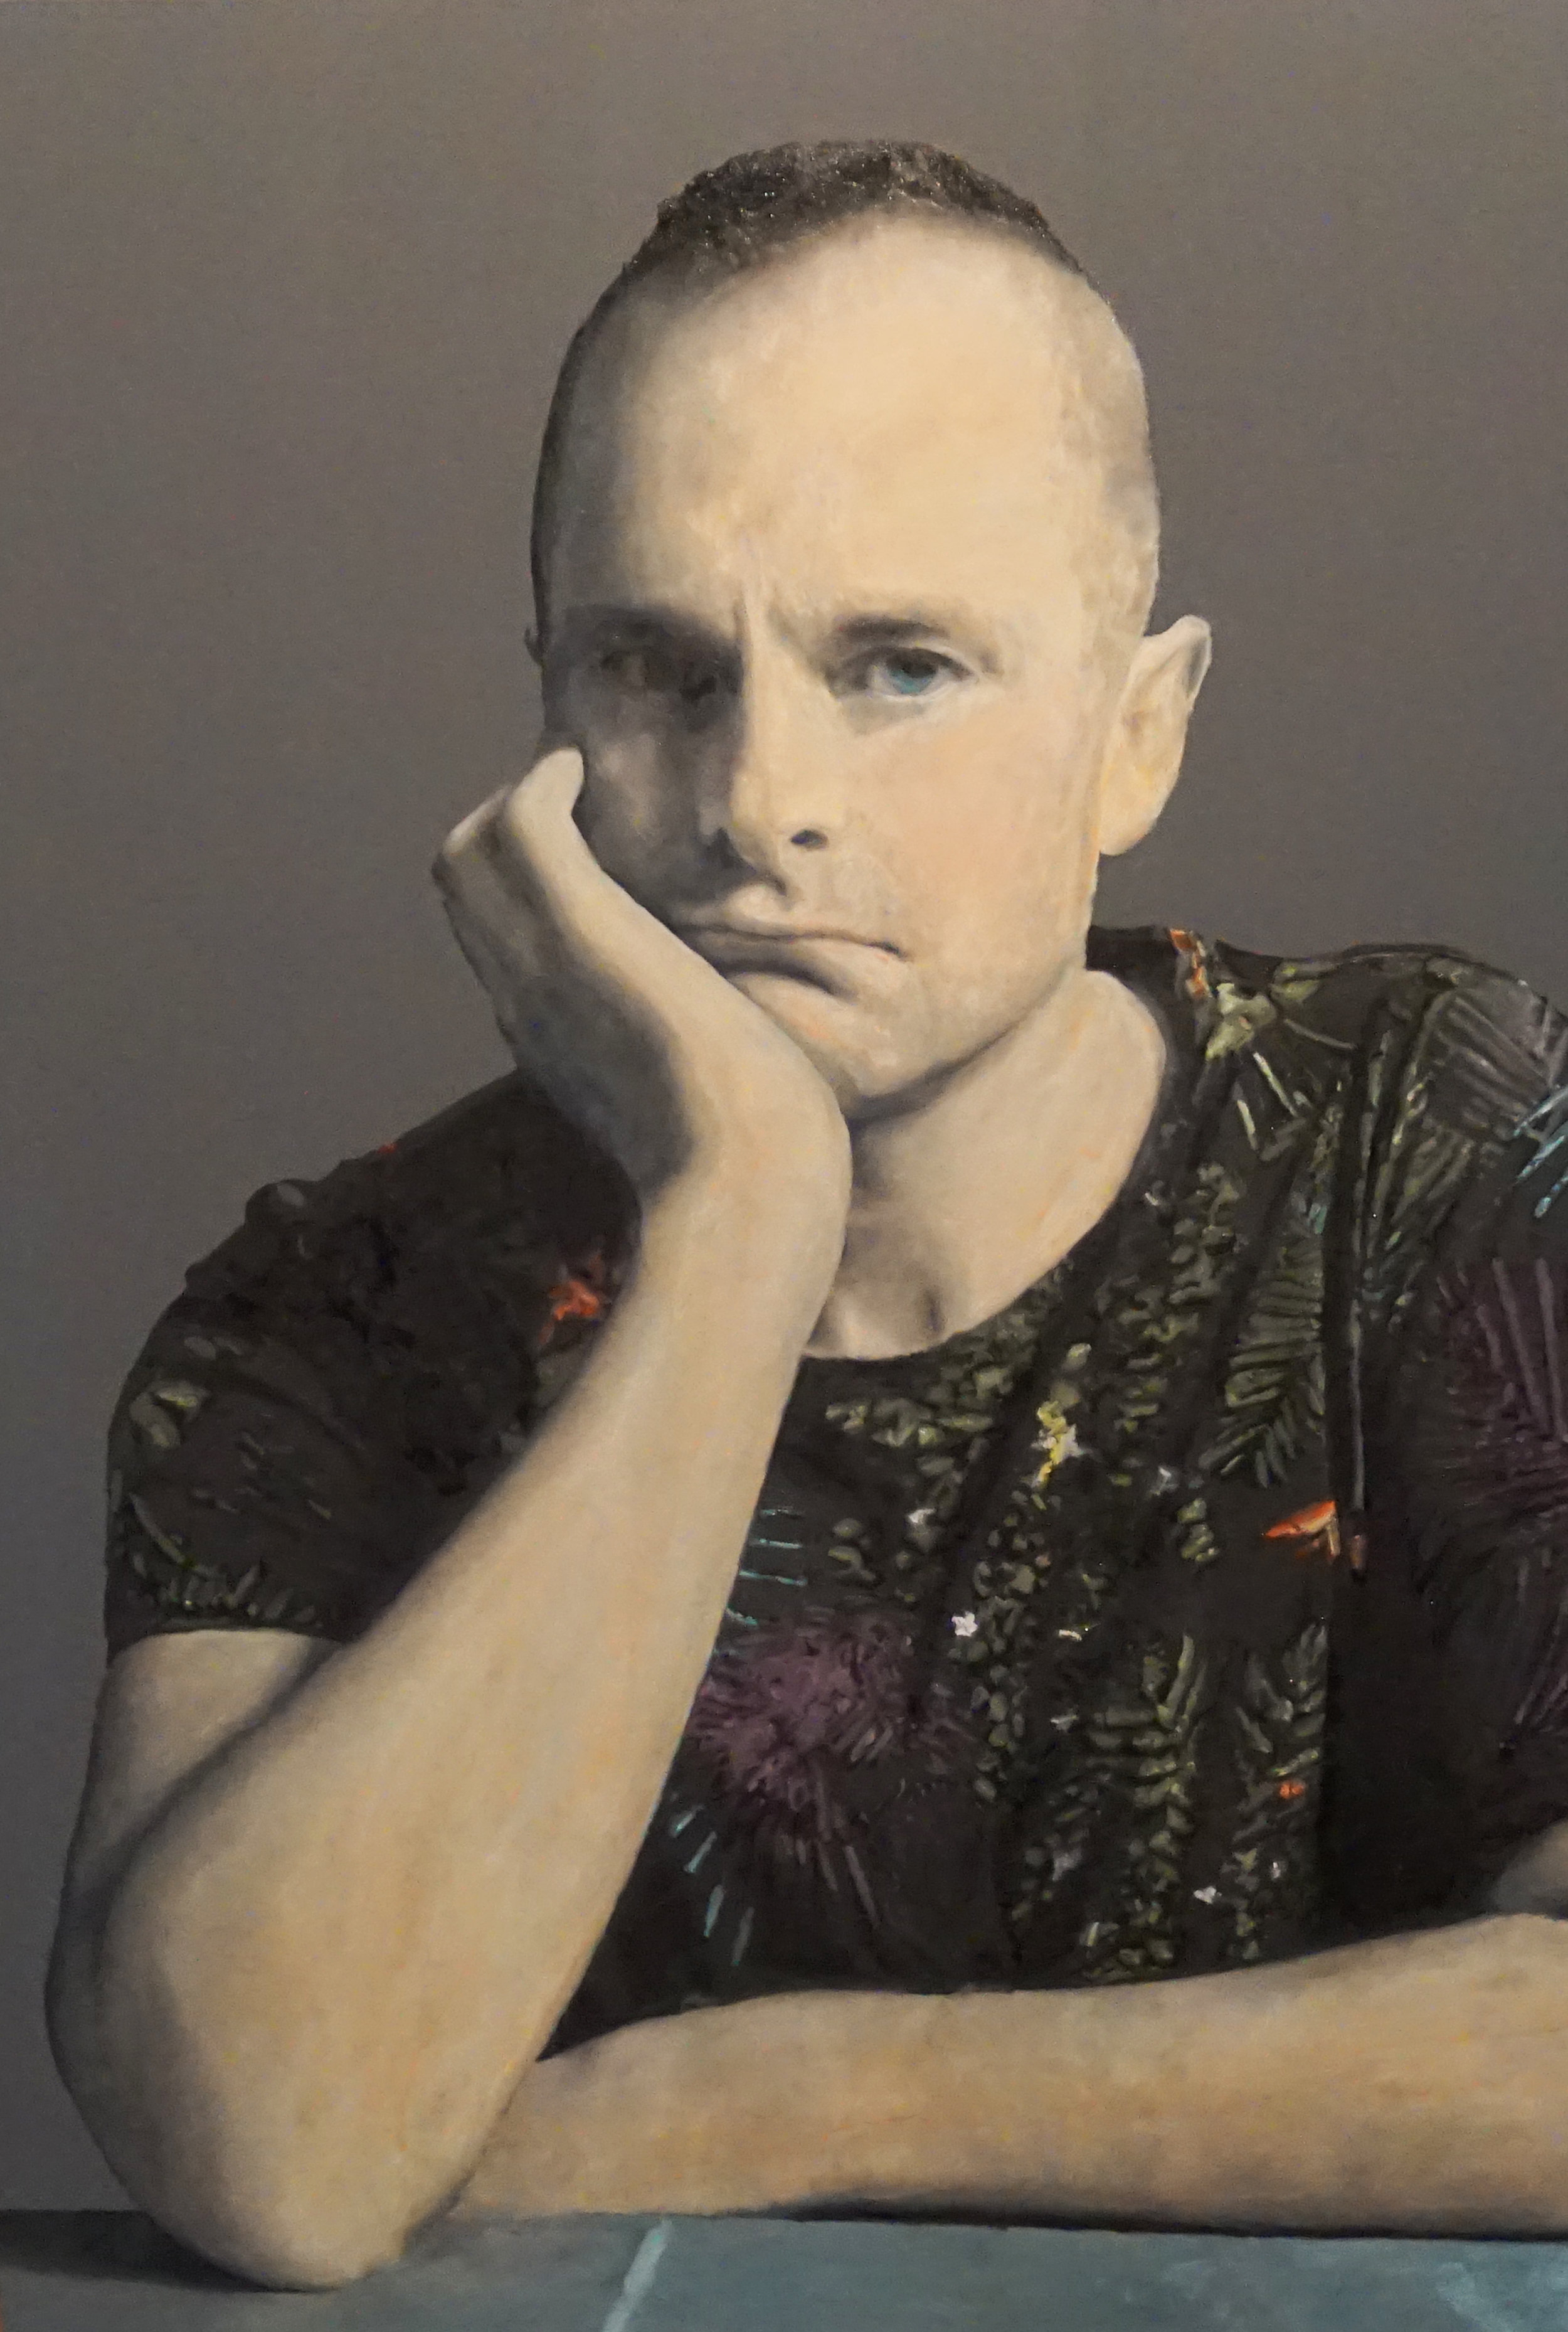 Jesse-Waugh-self-portrait-Melancholia-close.jpg